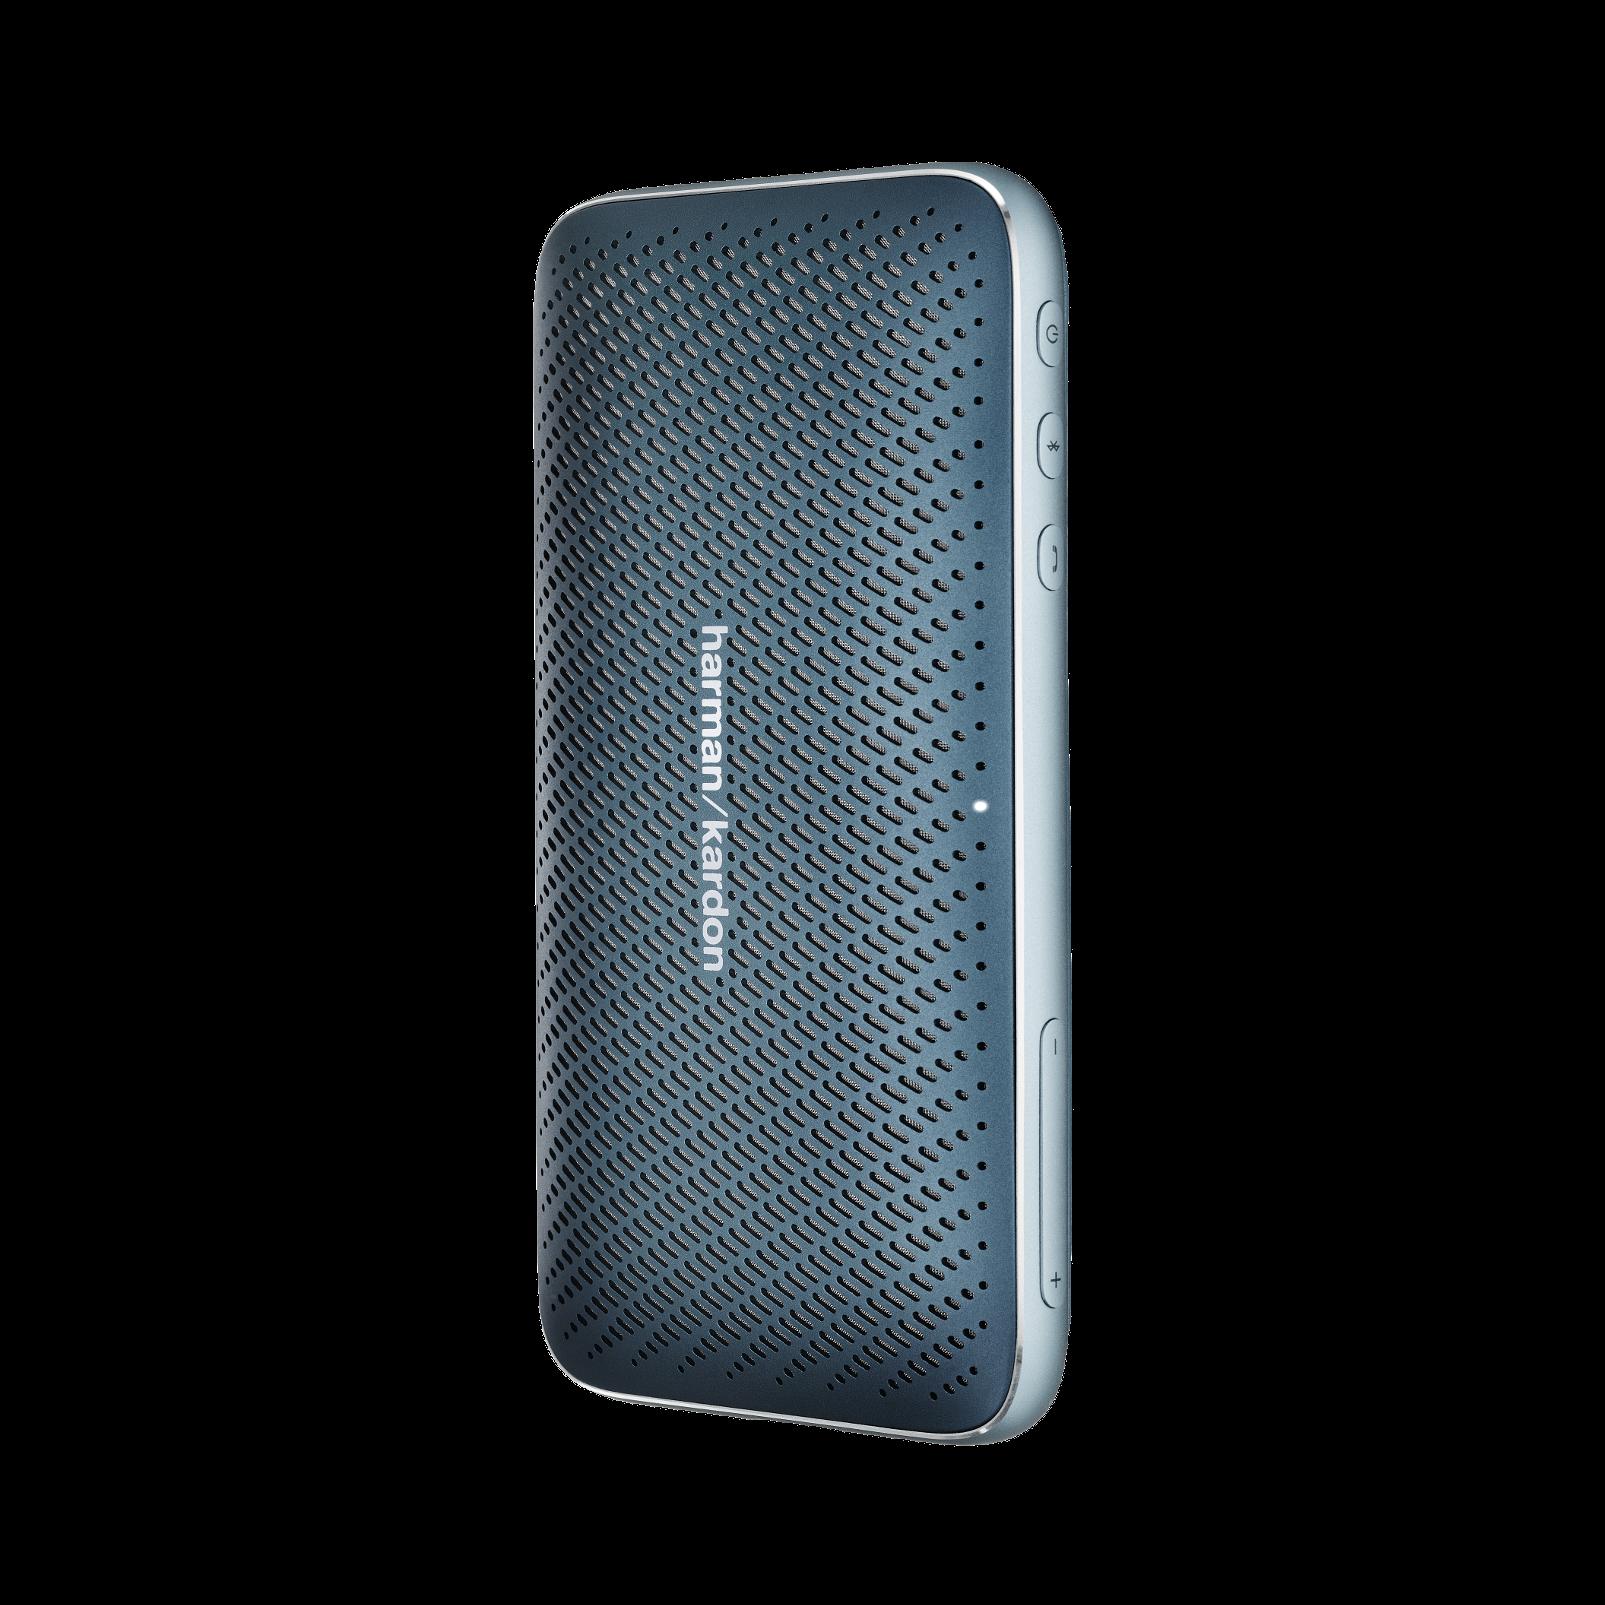 Harman Kardon Esquire Mini 2 - Blue - Ultra-slim and portable premium Bluetooth Speaker - Detailshot 2